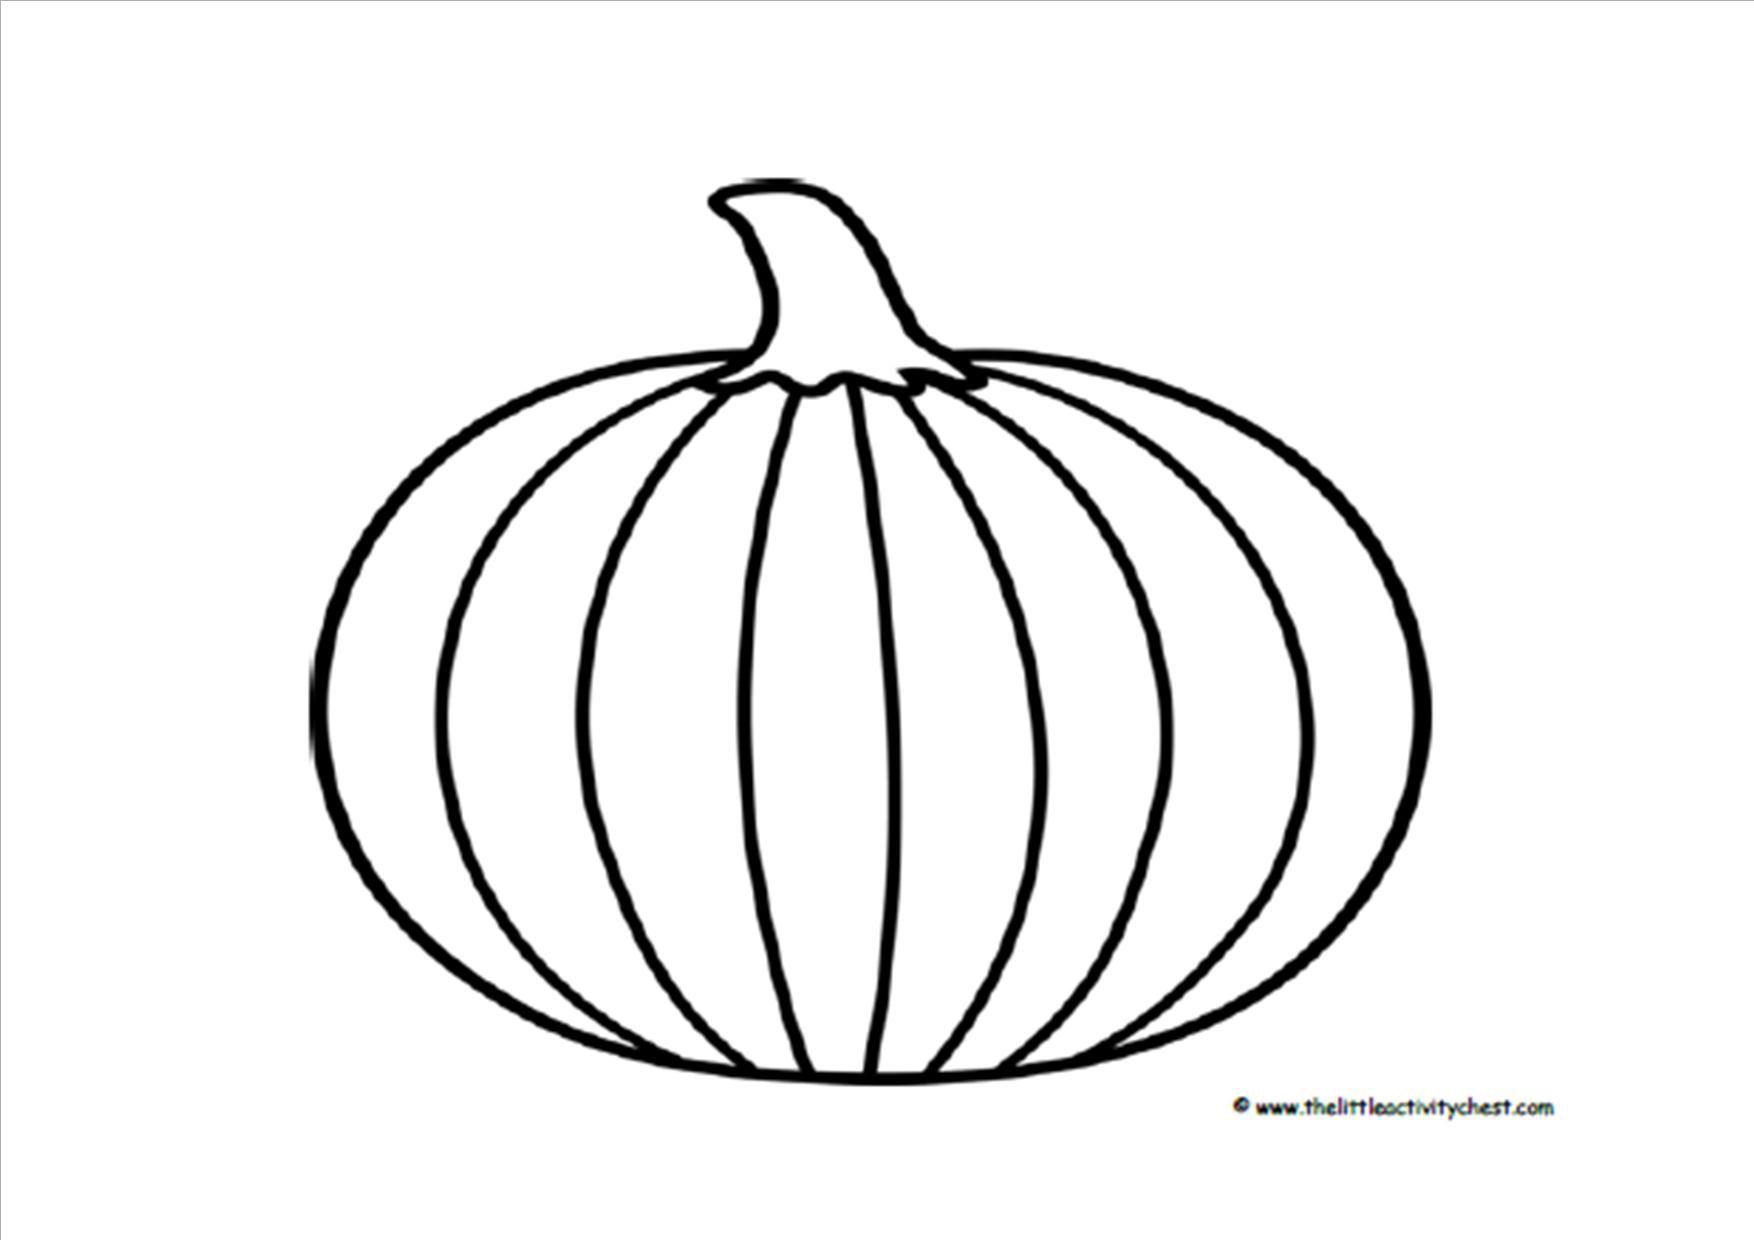 Printable Pumpkin Outline